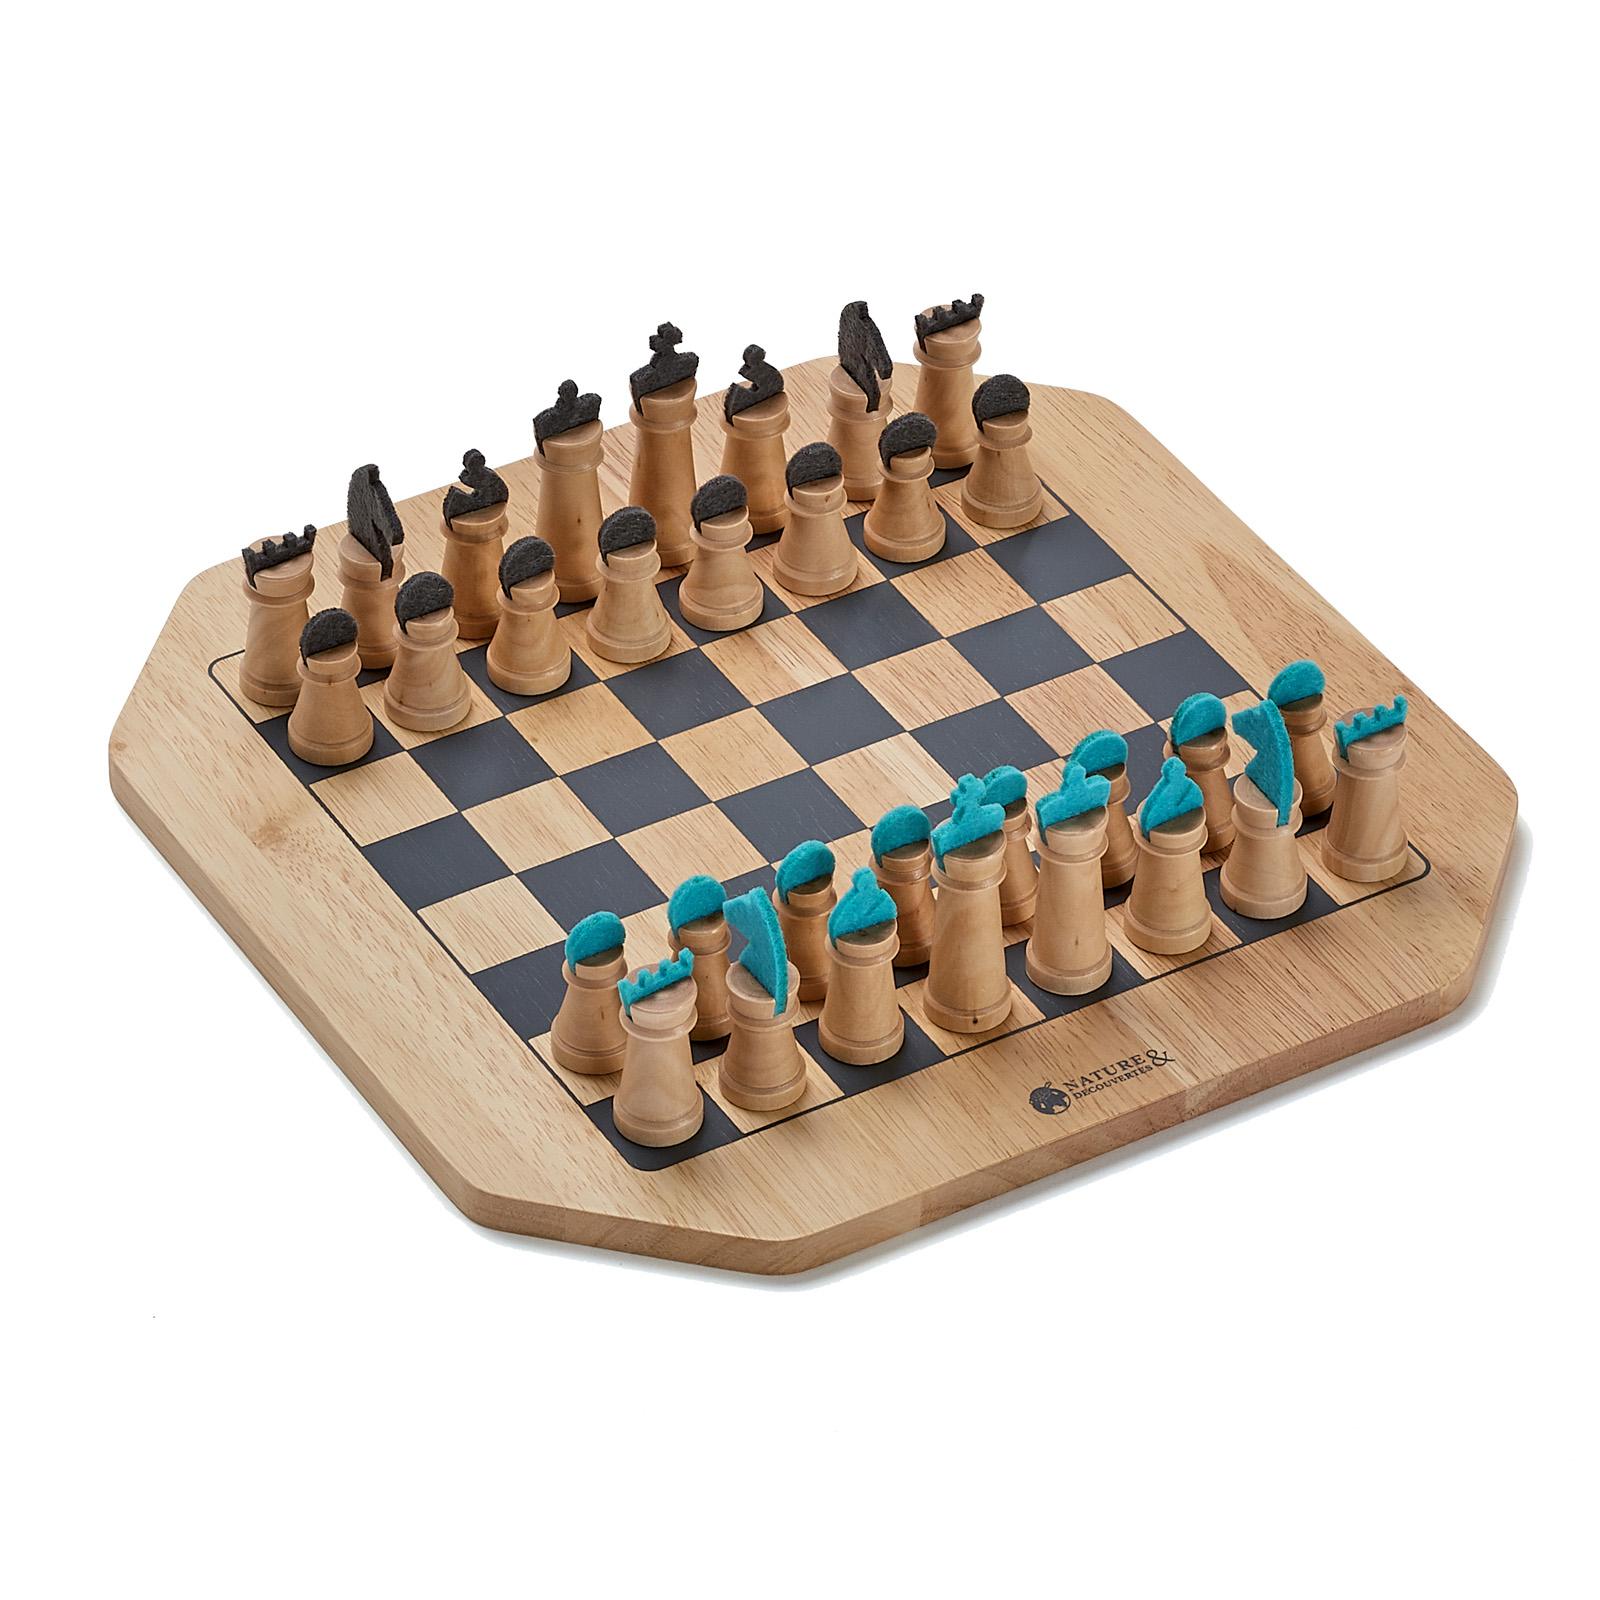 1NatureDécouvertes Jeu Jeu 2 en d'échecs T5JuK3lF1c